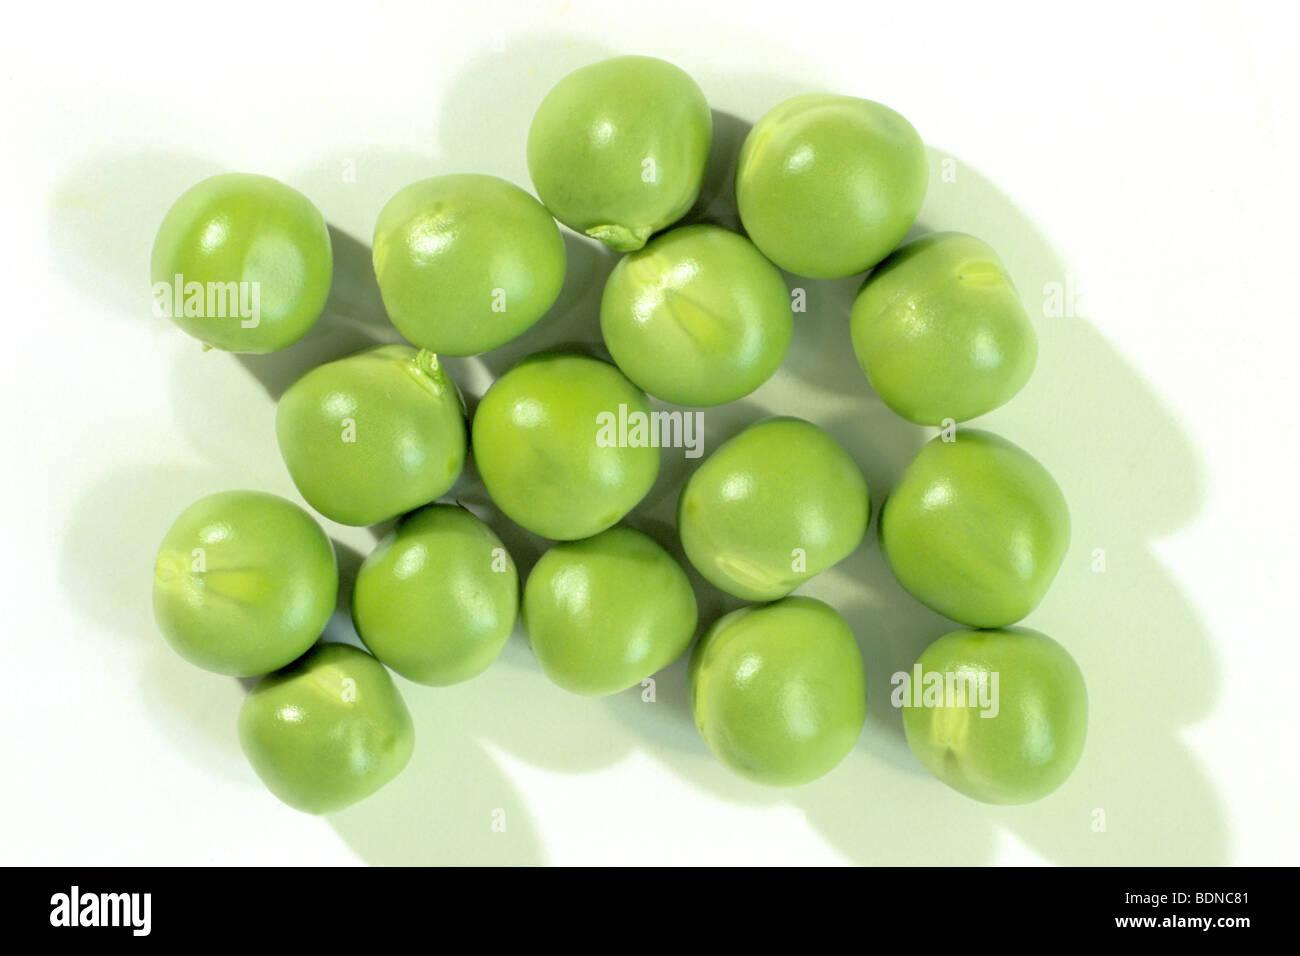 garden pea pea pisum sativum peas studio picture stock - Garden Peas